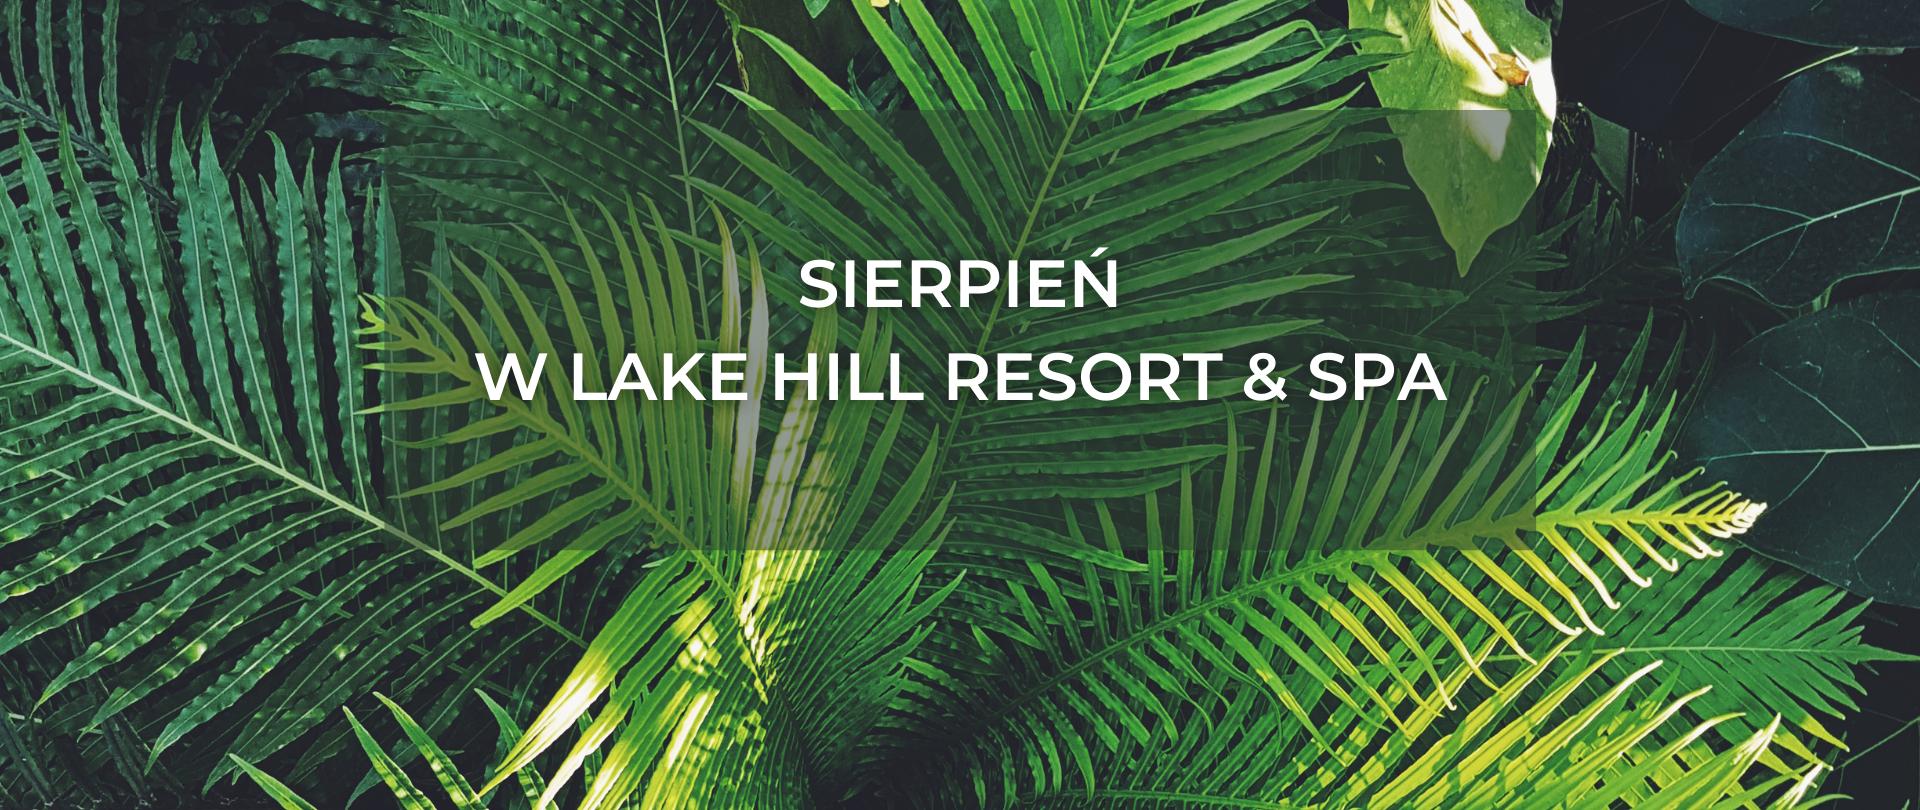 Sierpień w Lake Hill Resort & SPA